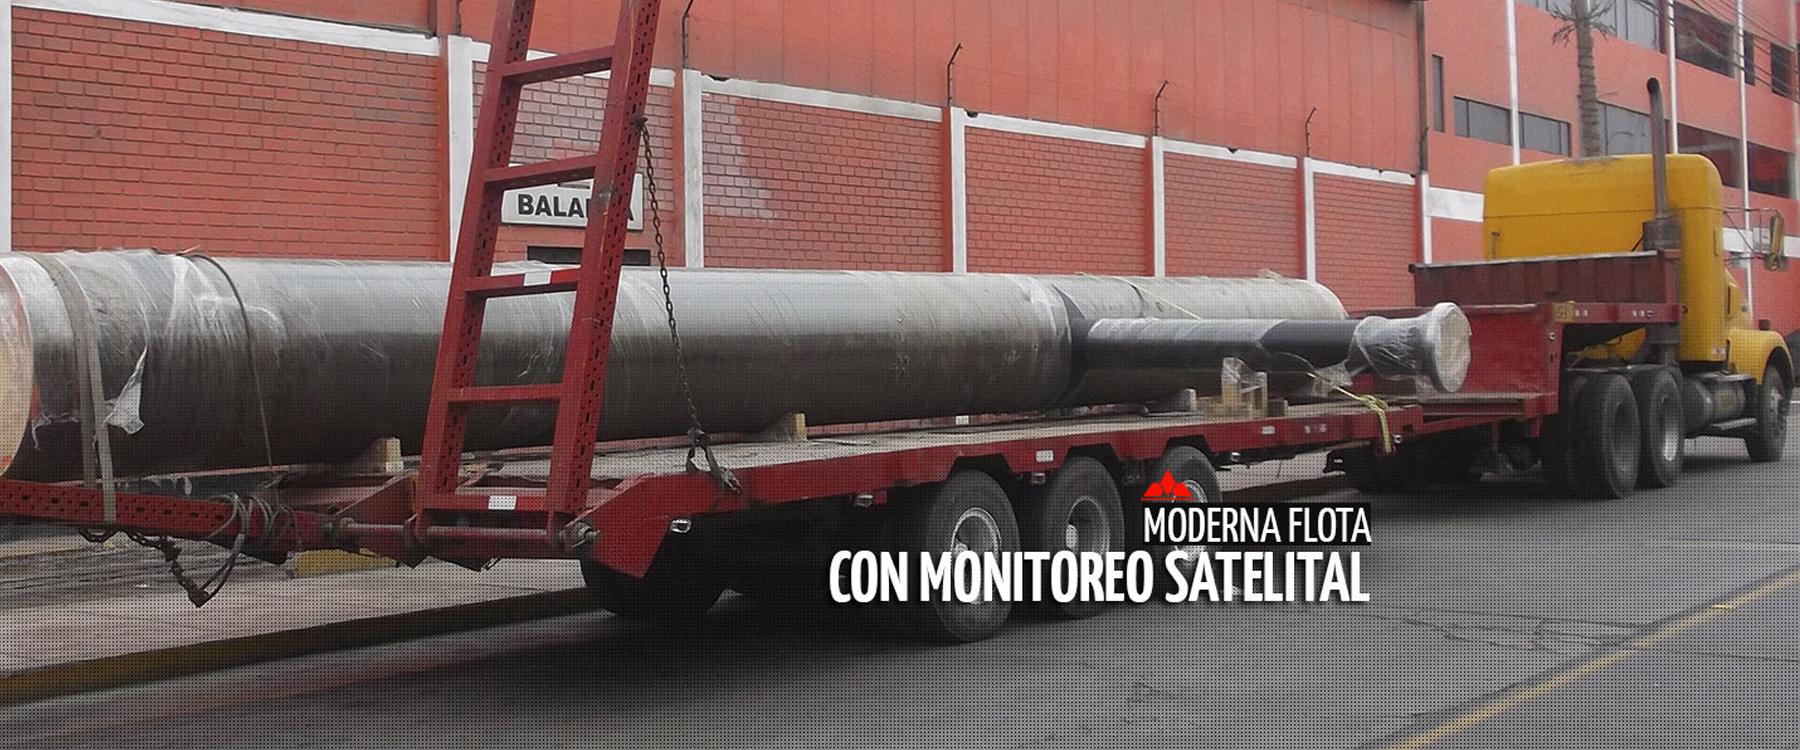 moderna-flota-con-monitoreo-satelital